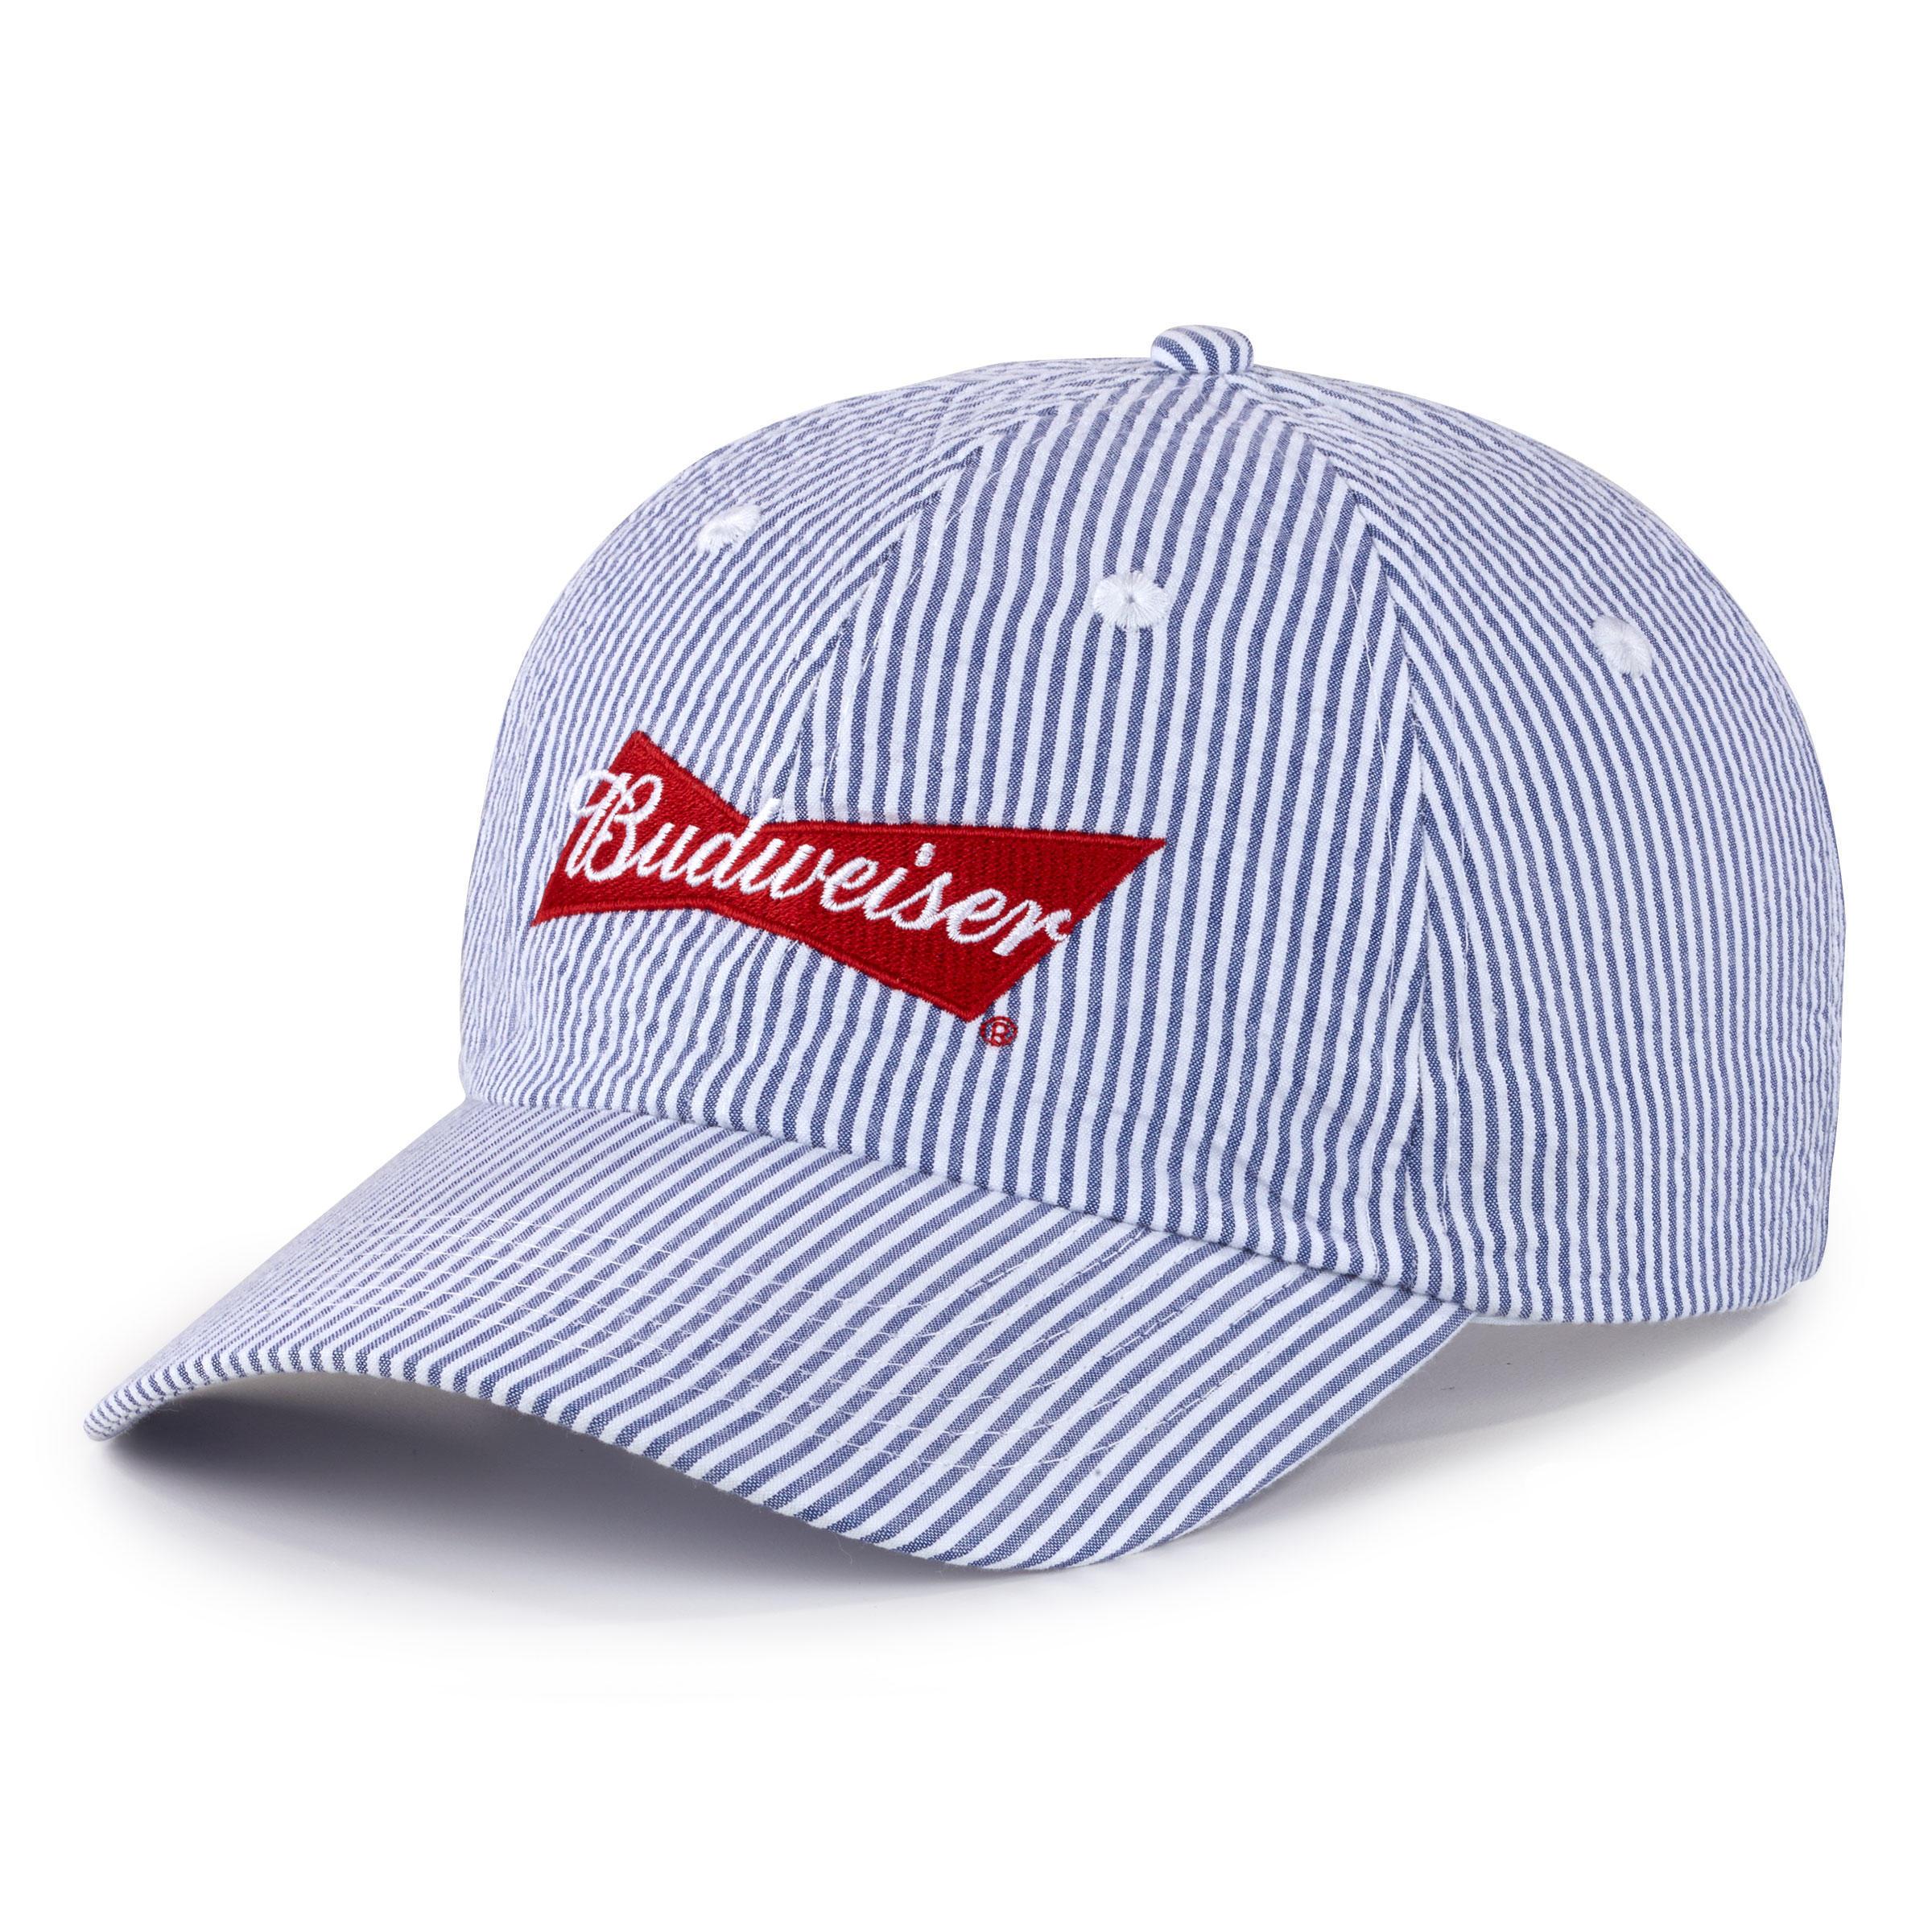 70b497db8add5 Budweiser Seersucker Striped Hat - The Beer Gear Store